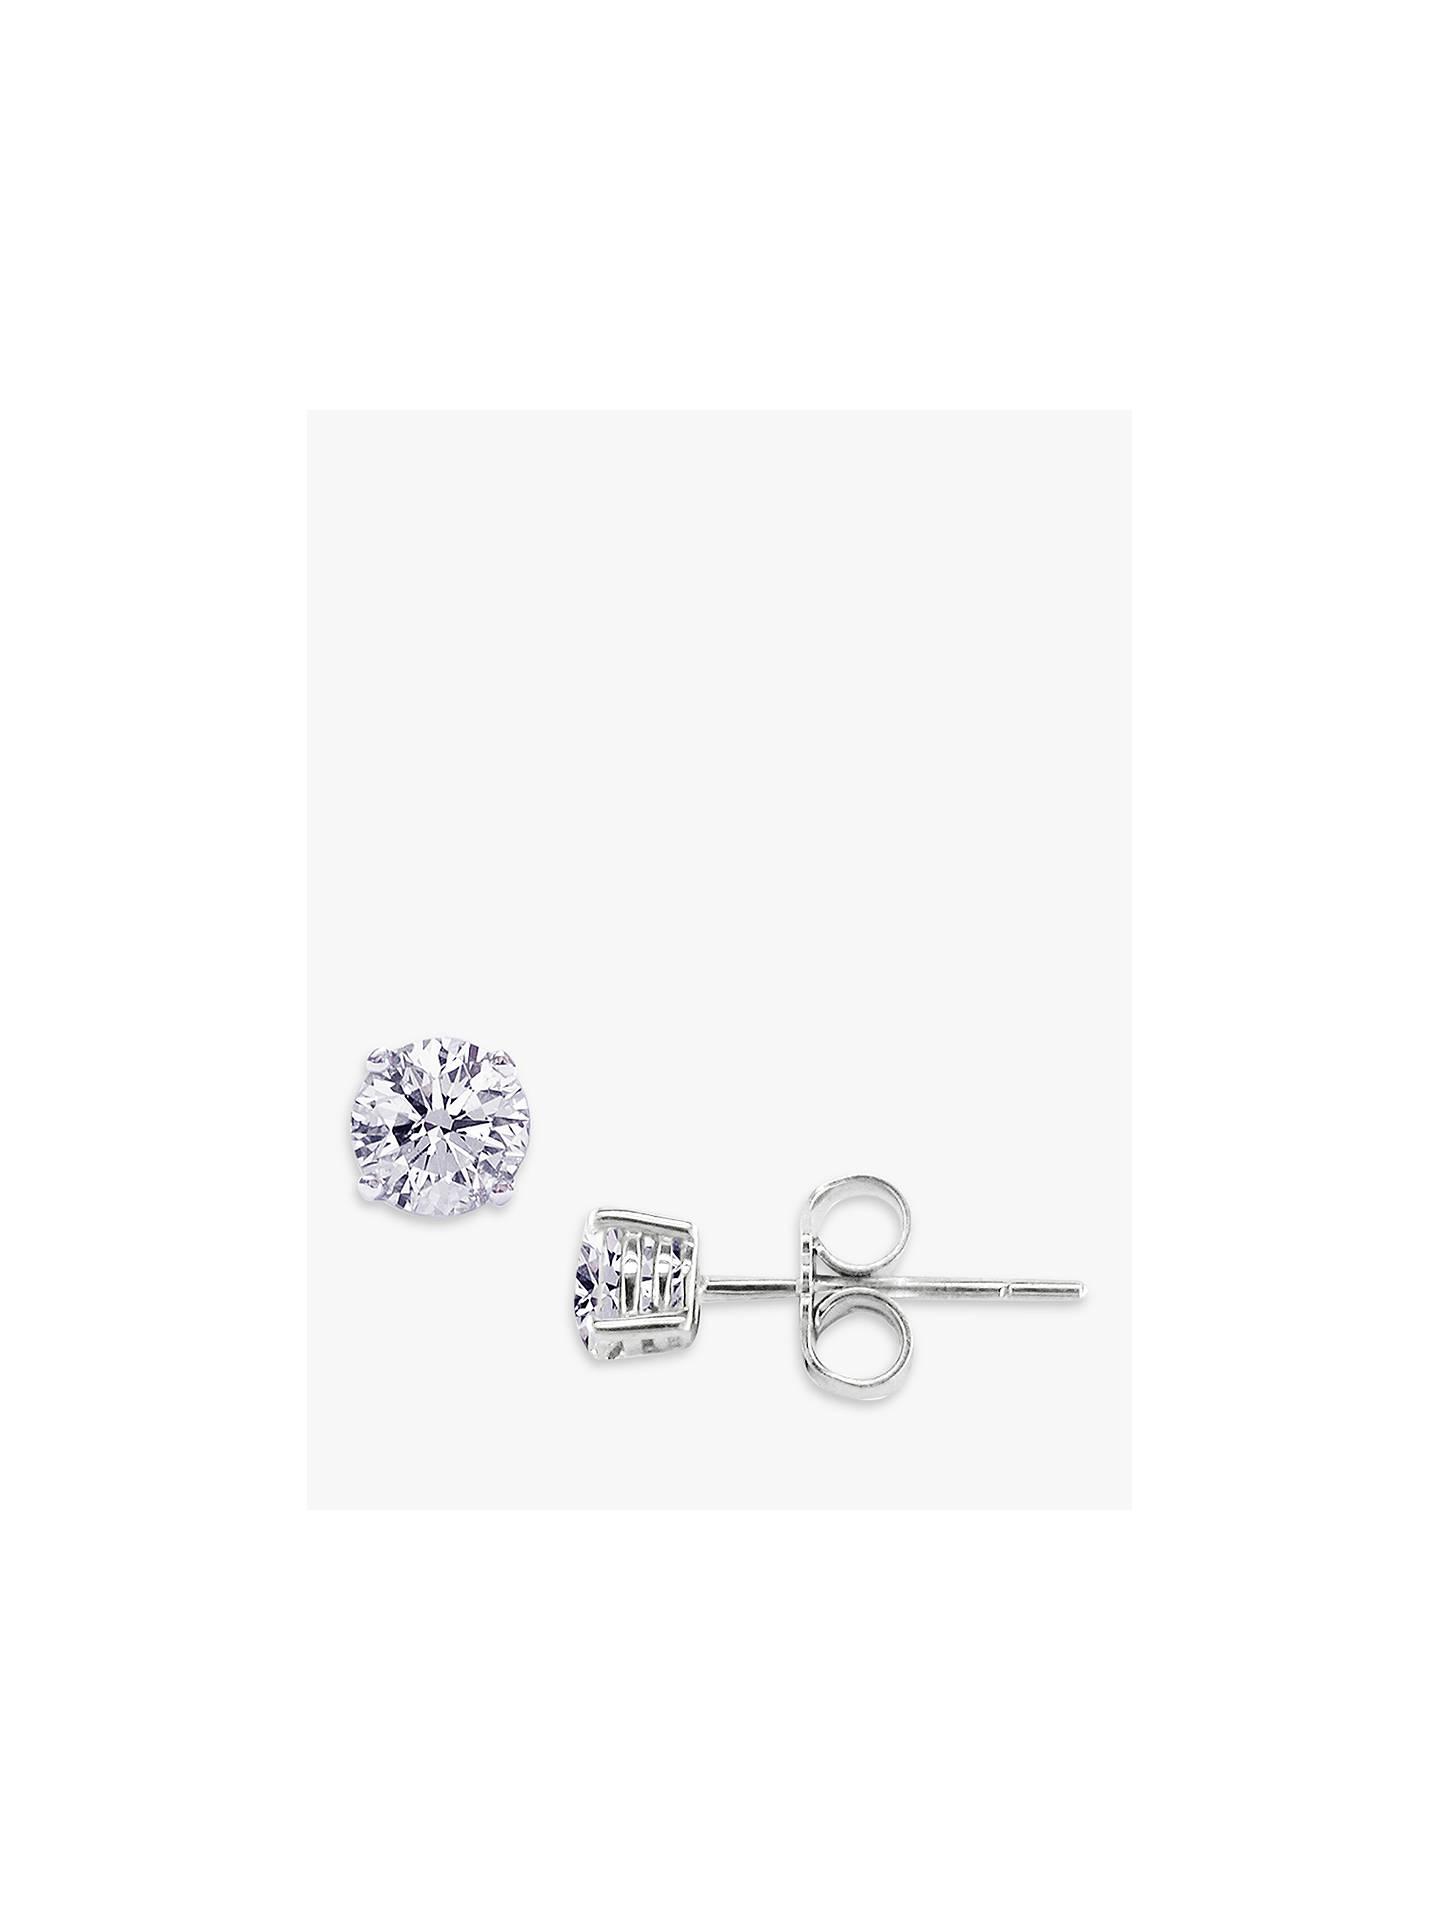 Ewa 18ct White Gold 0 80ct Diamond 4 Claw Stud Earrings White Gold